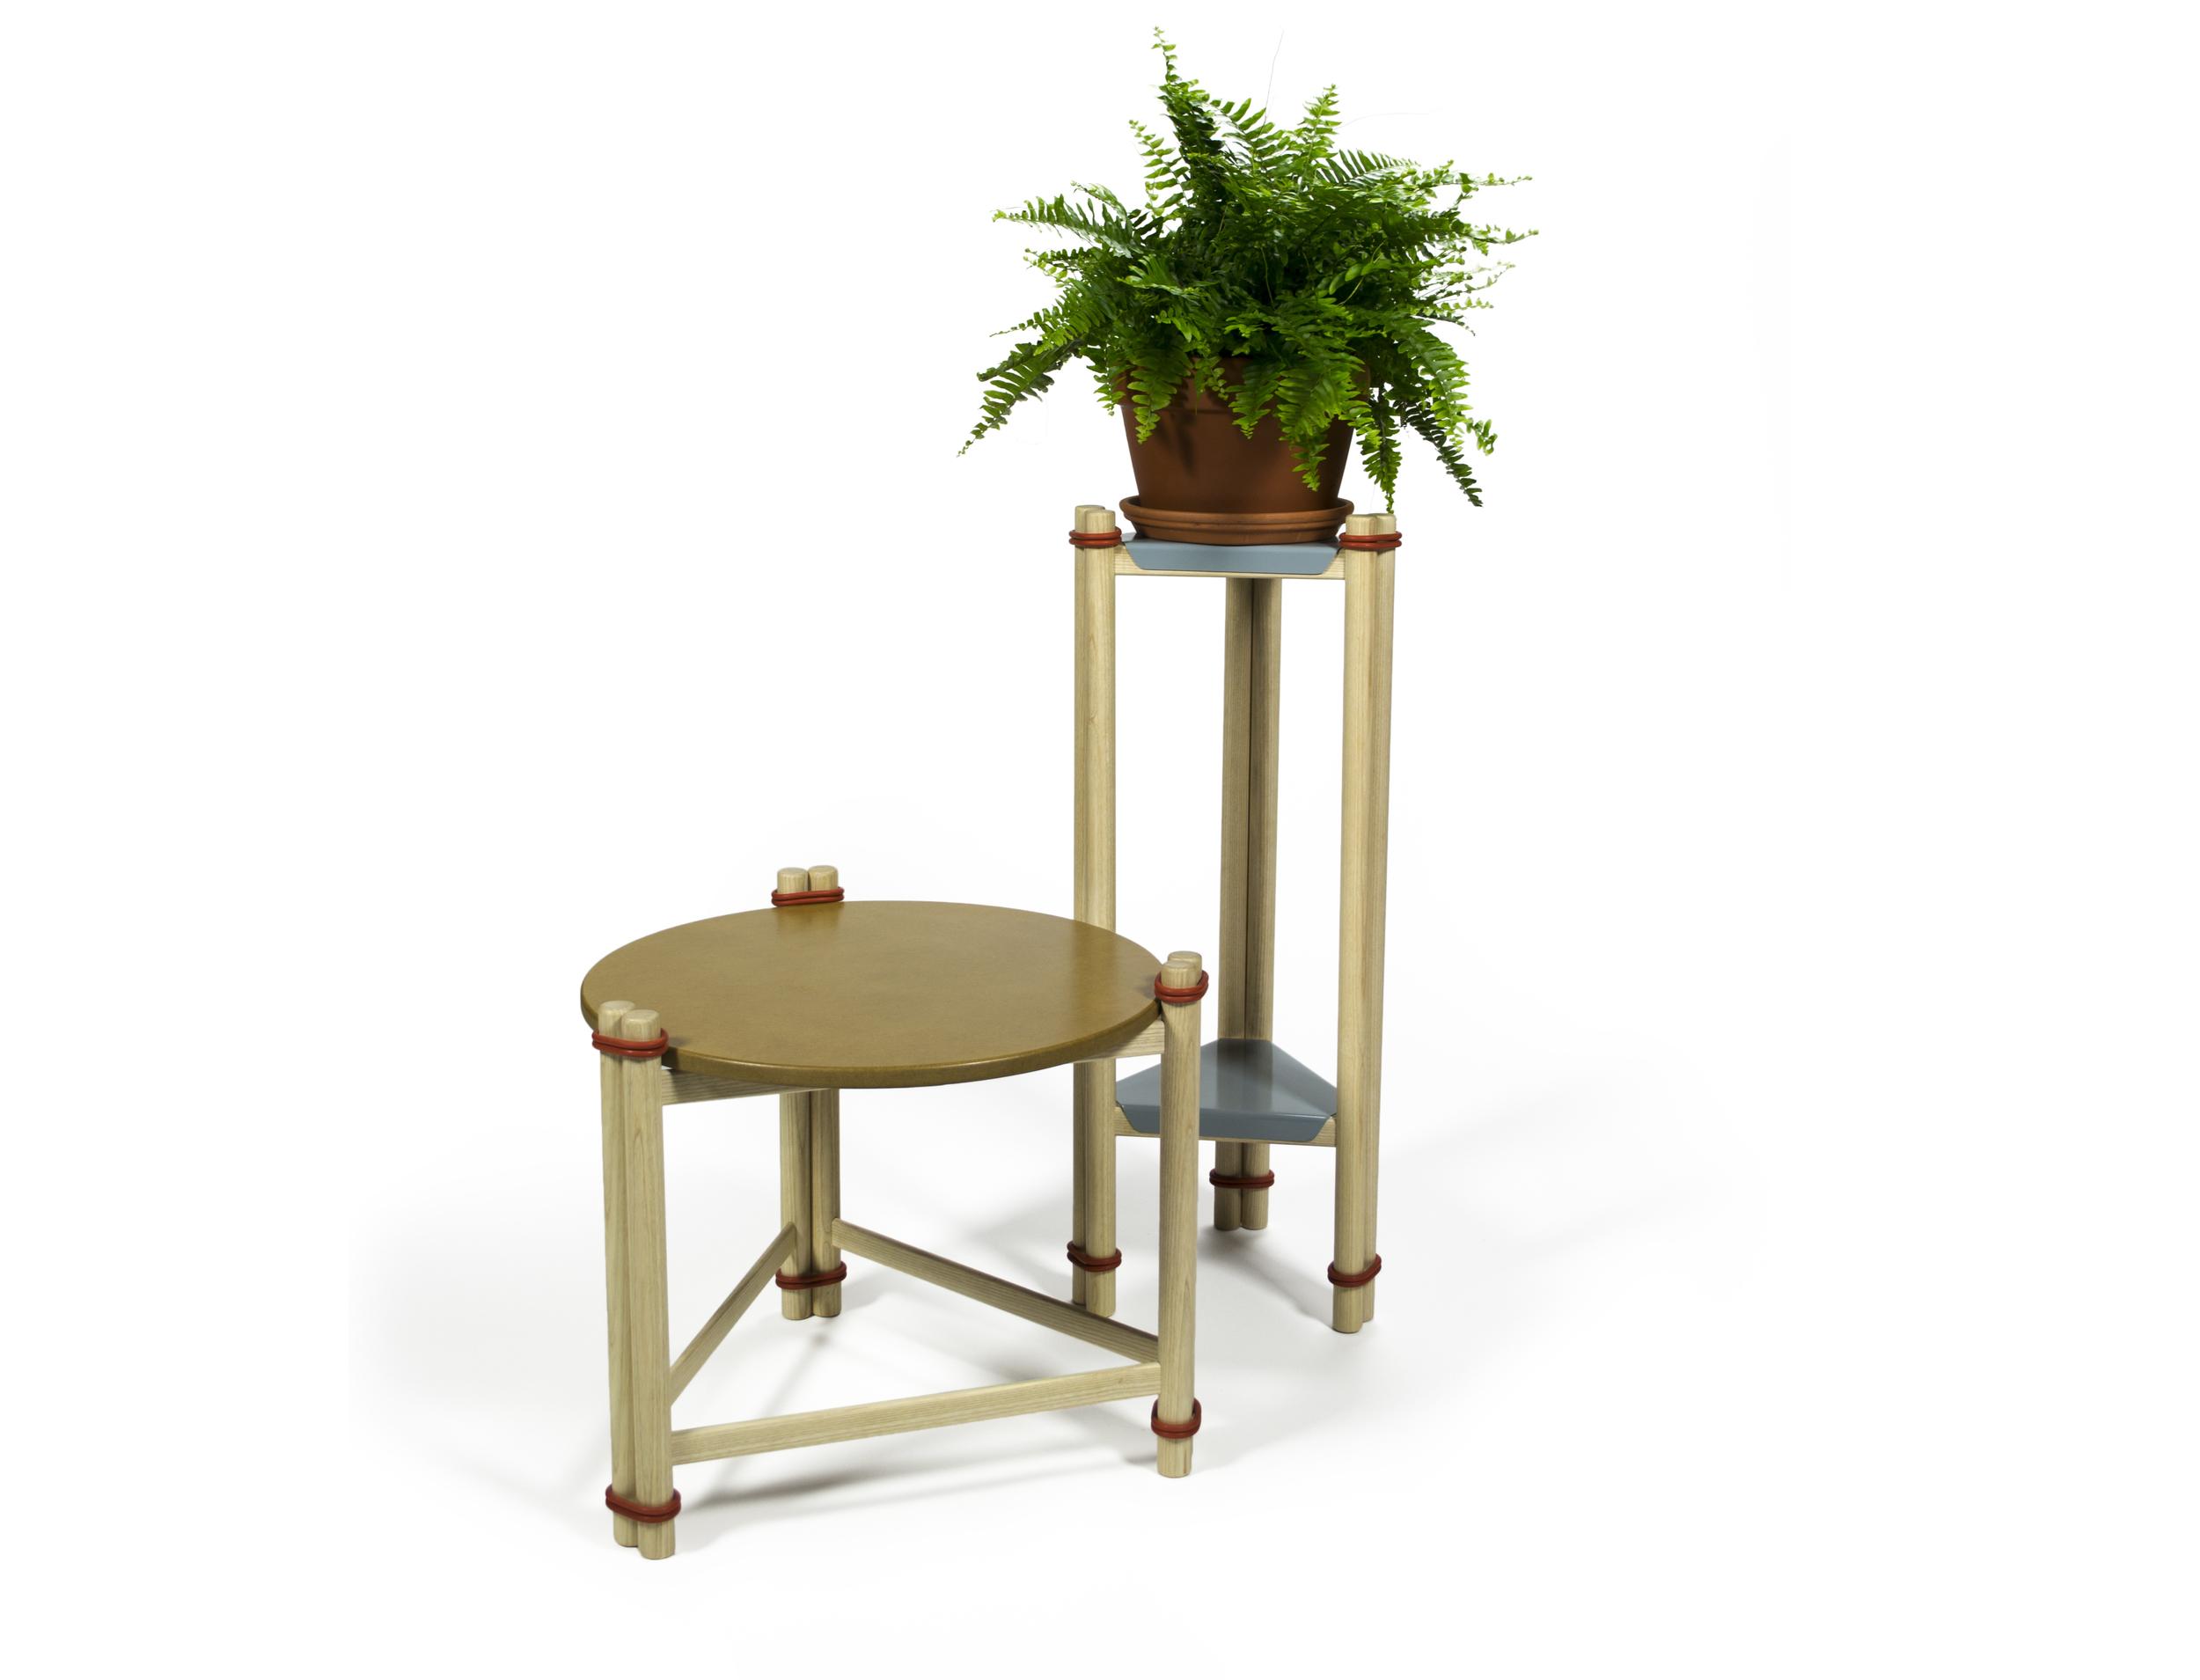 plantstand_table crop.jpg